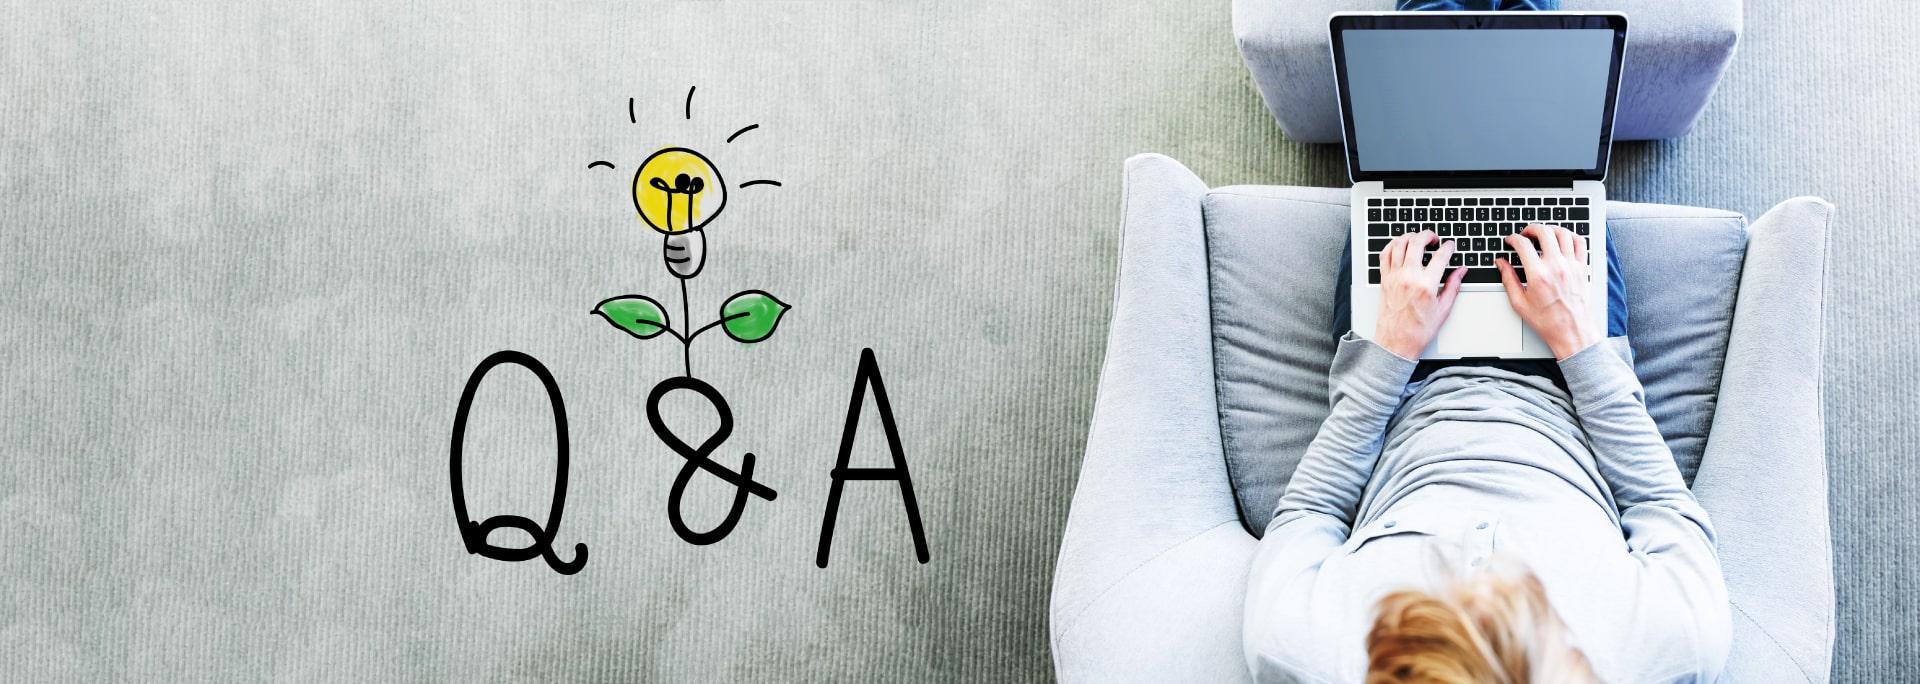 【SORENA】飲食店のメニューをQRコードからスマホに表示   よくある質問